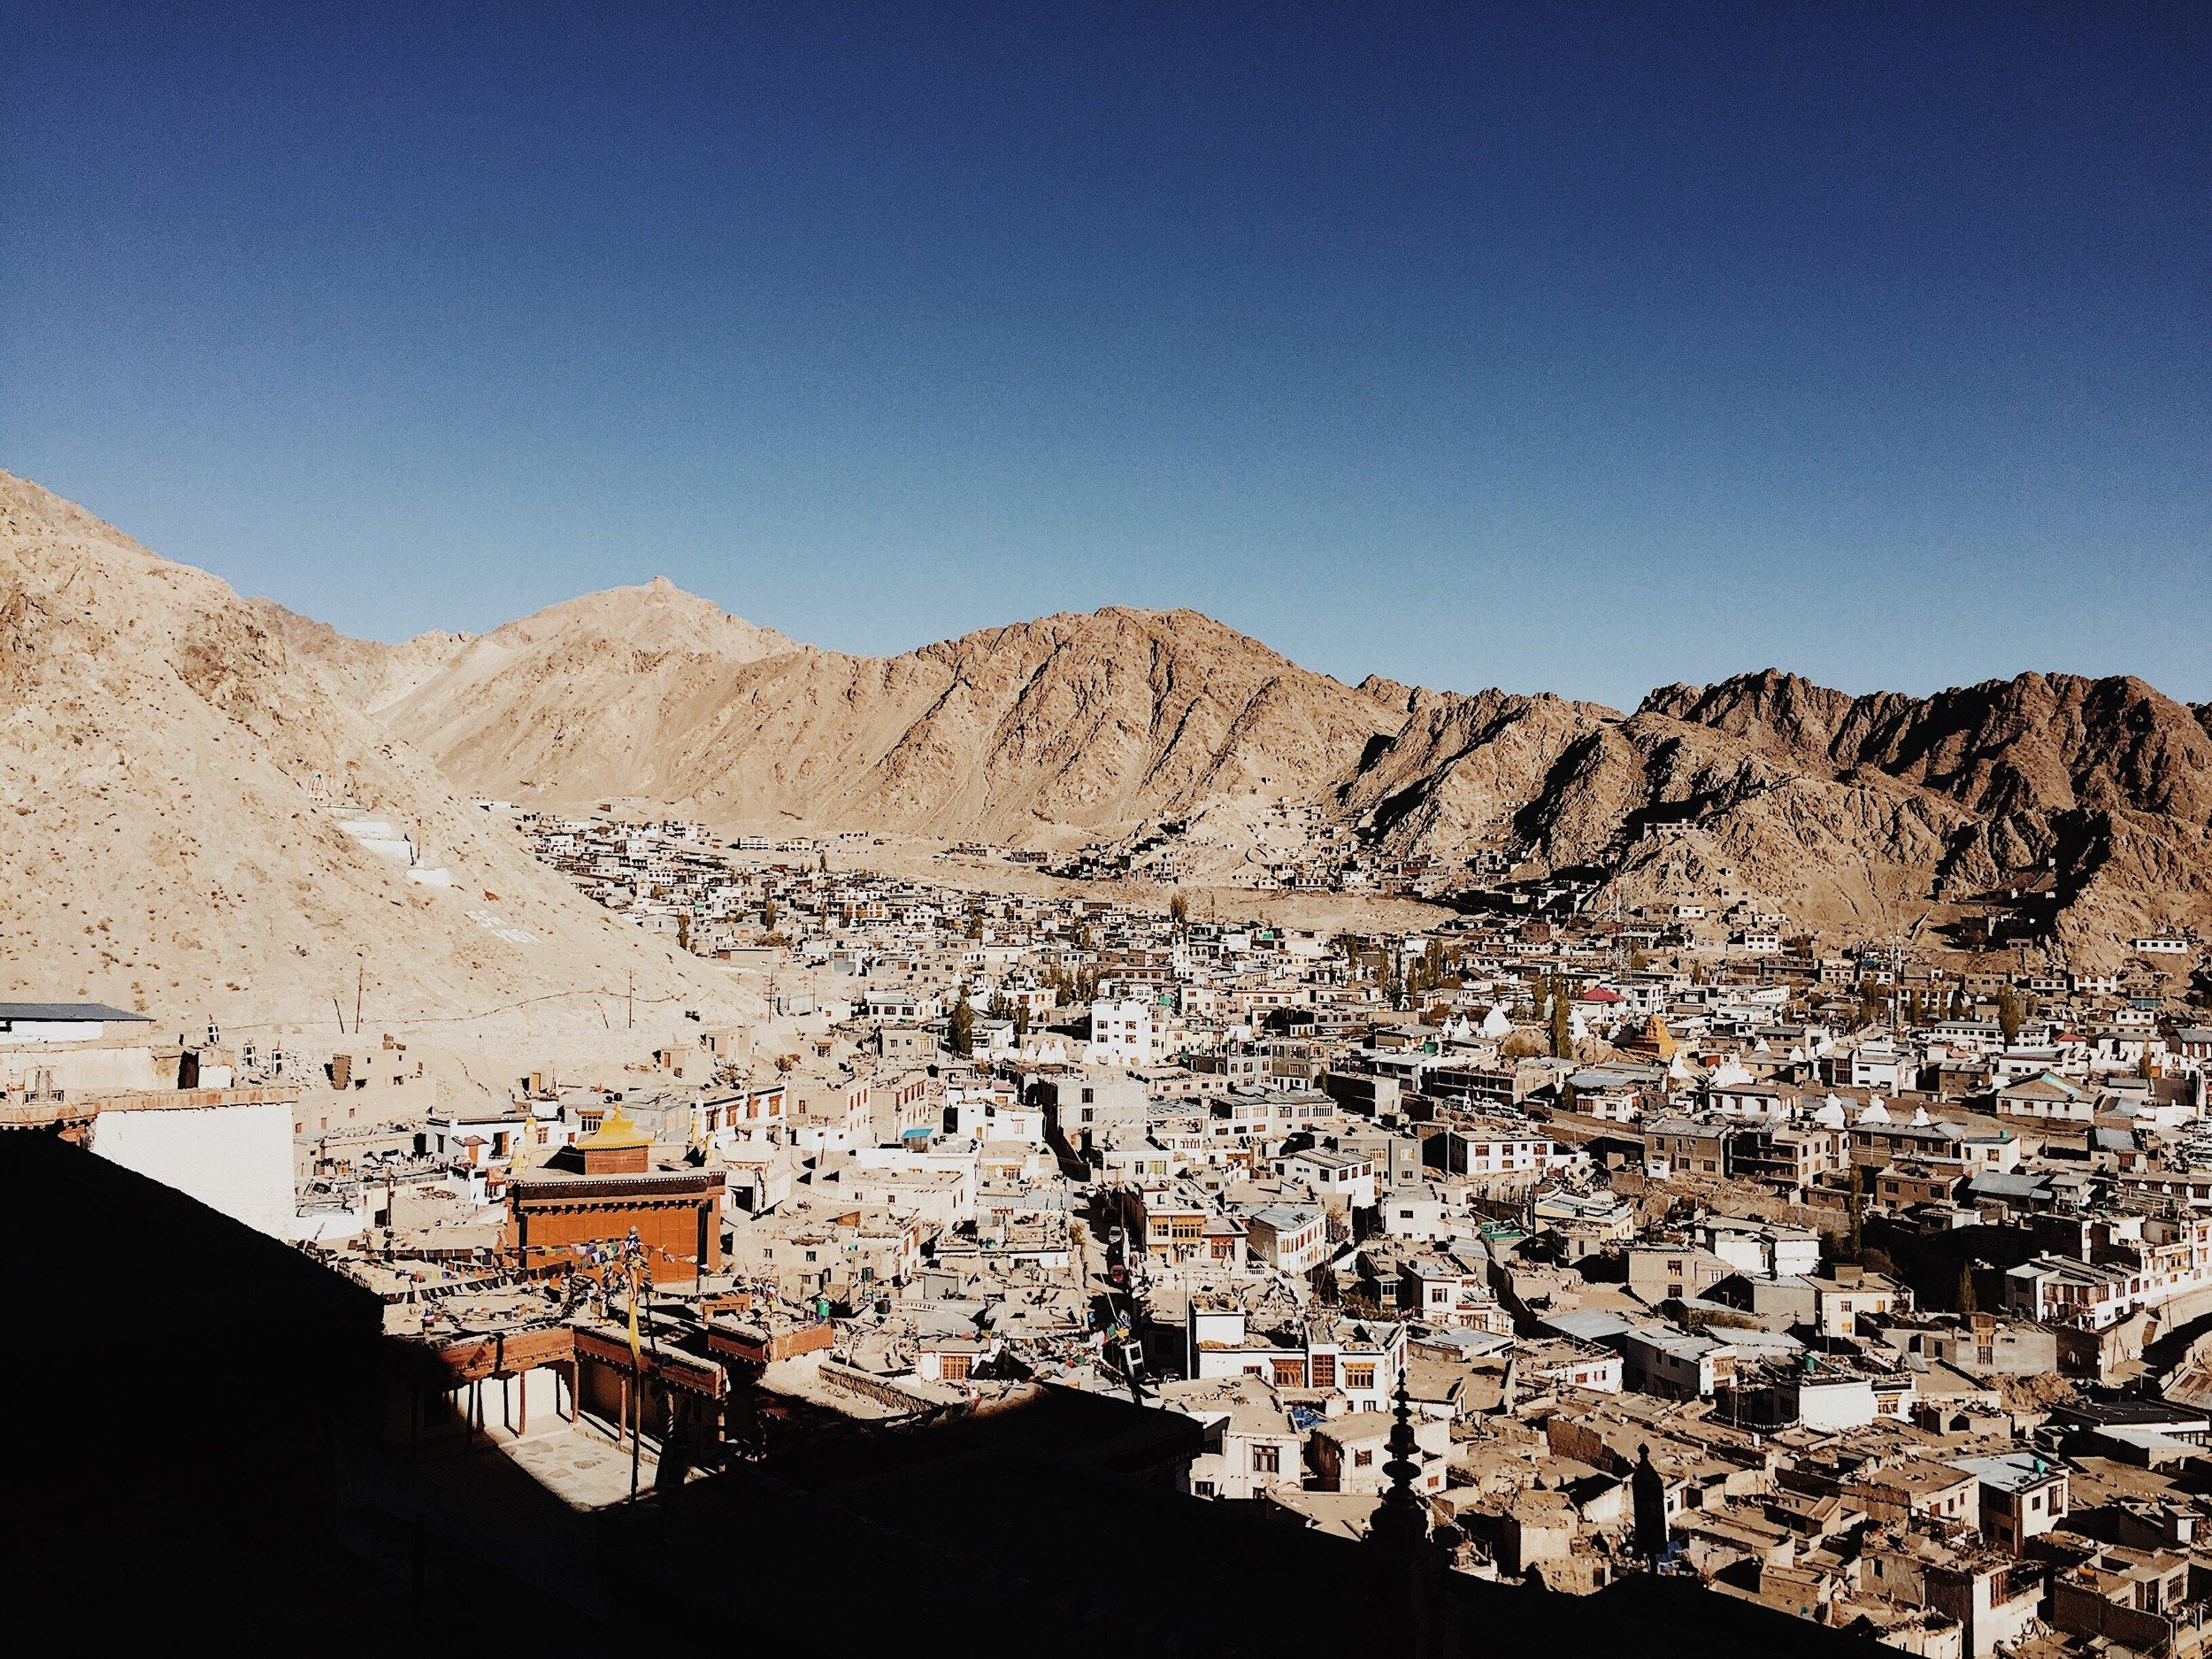 Leh Town. Pic by Shreya Kollipara